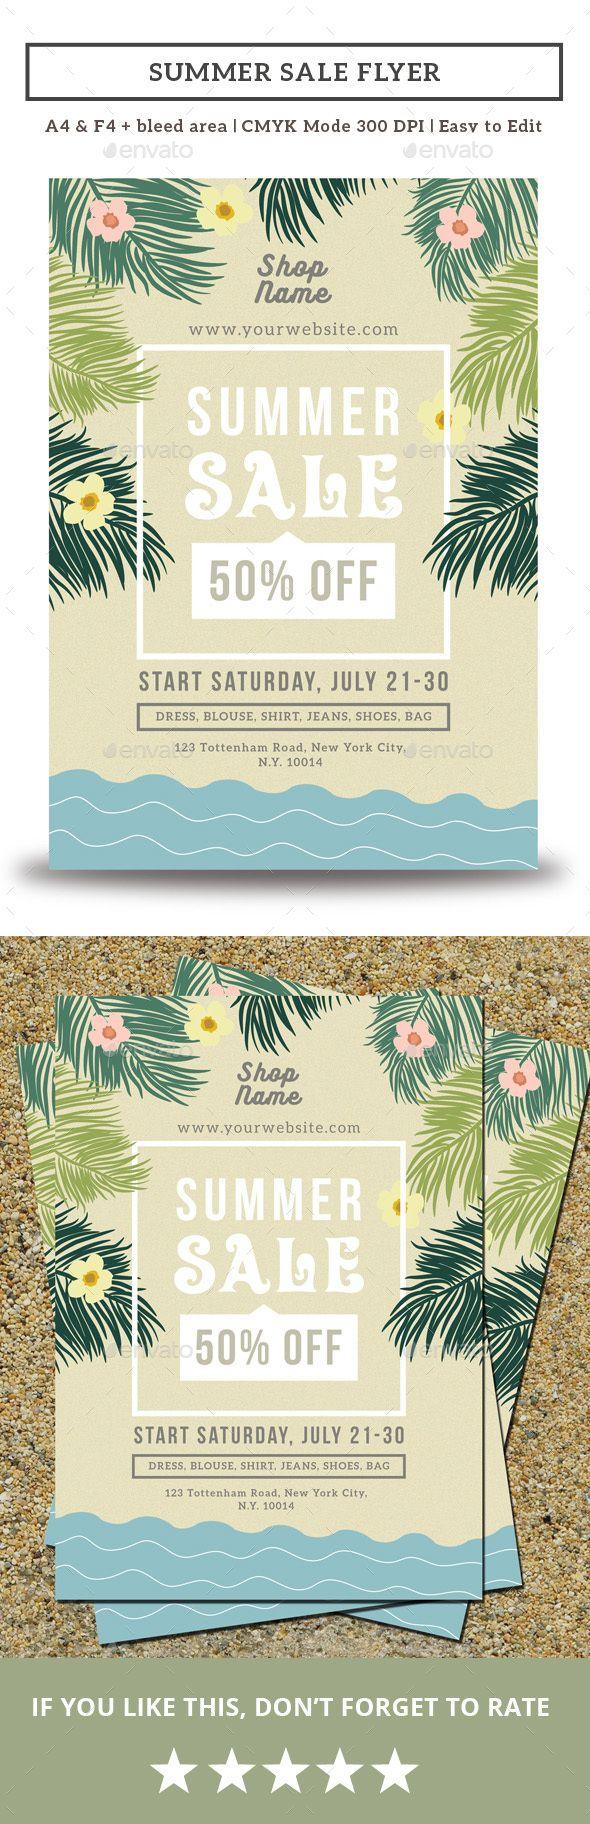 Summer Sale Flyer Template PSD. Download here: https://graphicriver.net/item/summer-sale-flyer/16930399?ref=ksioks